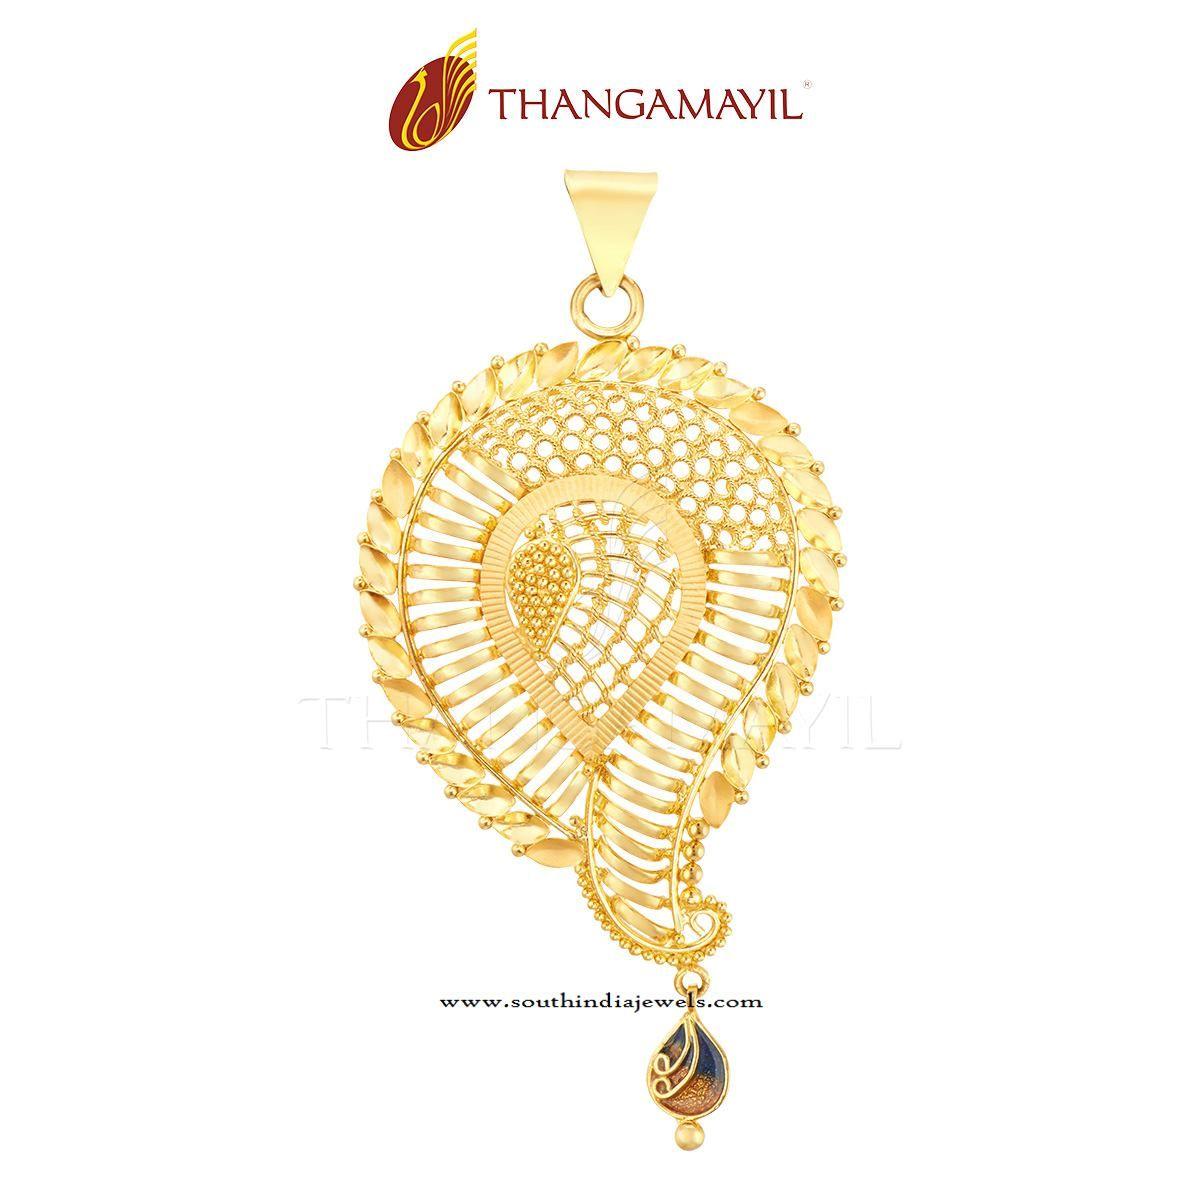 22k gold designer gold pendant gold pendant pendants and gold 22k gold designer gold pendant south india jewels mozeypictures Choice Image